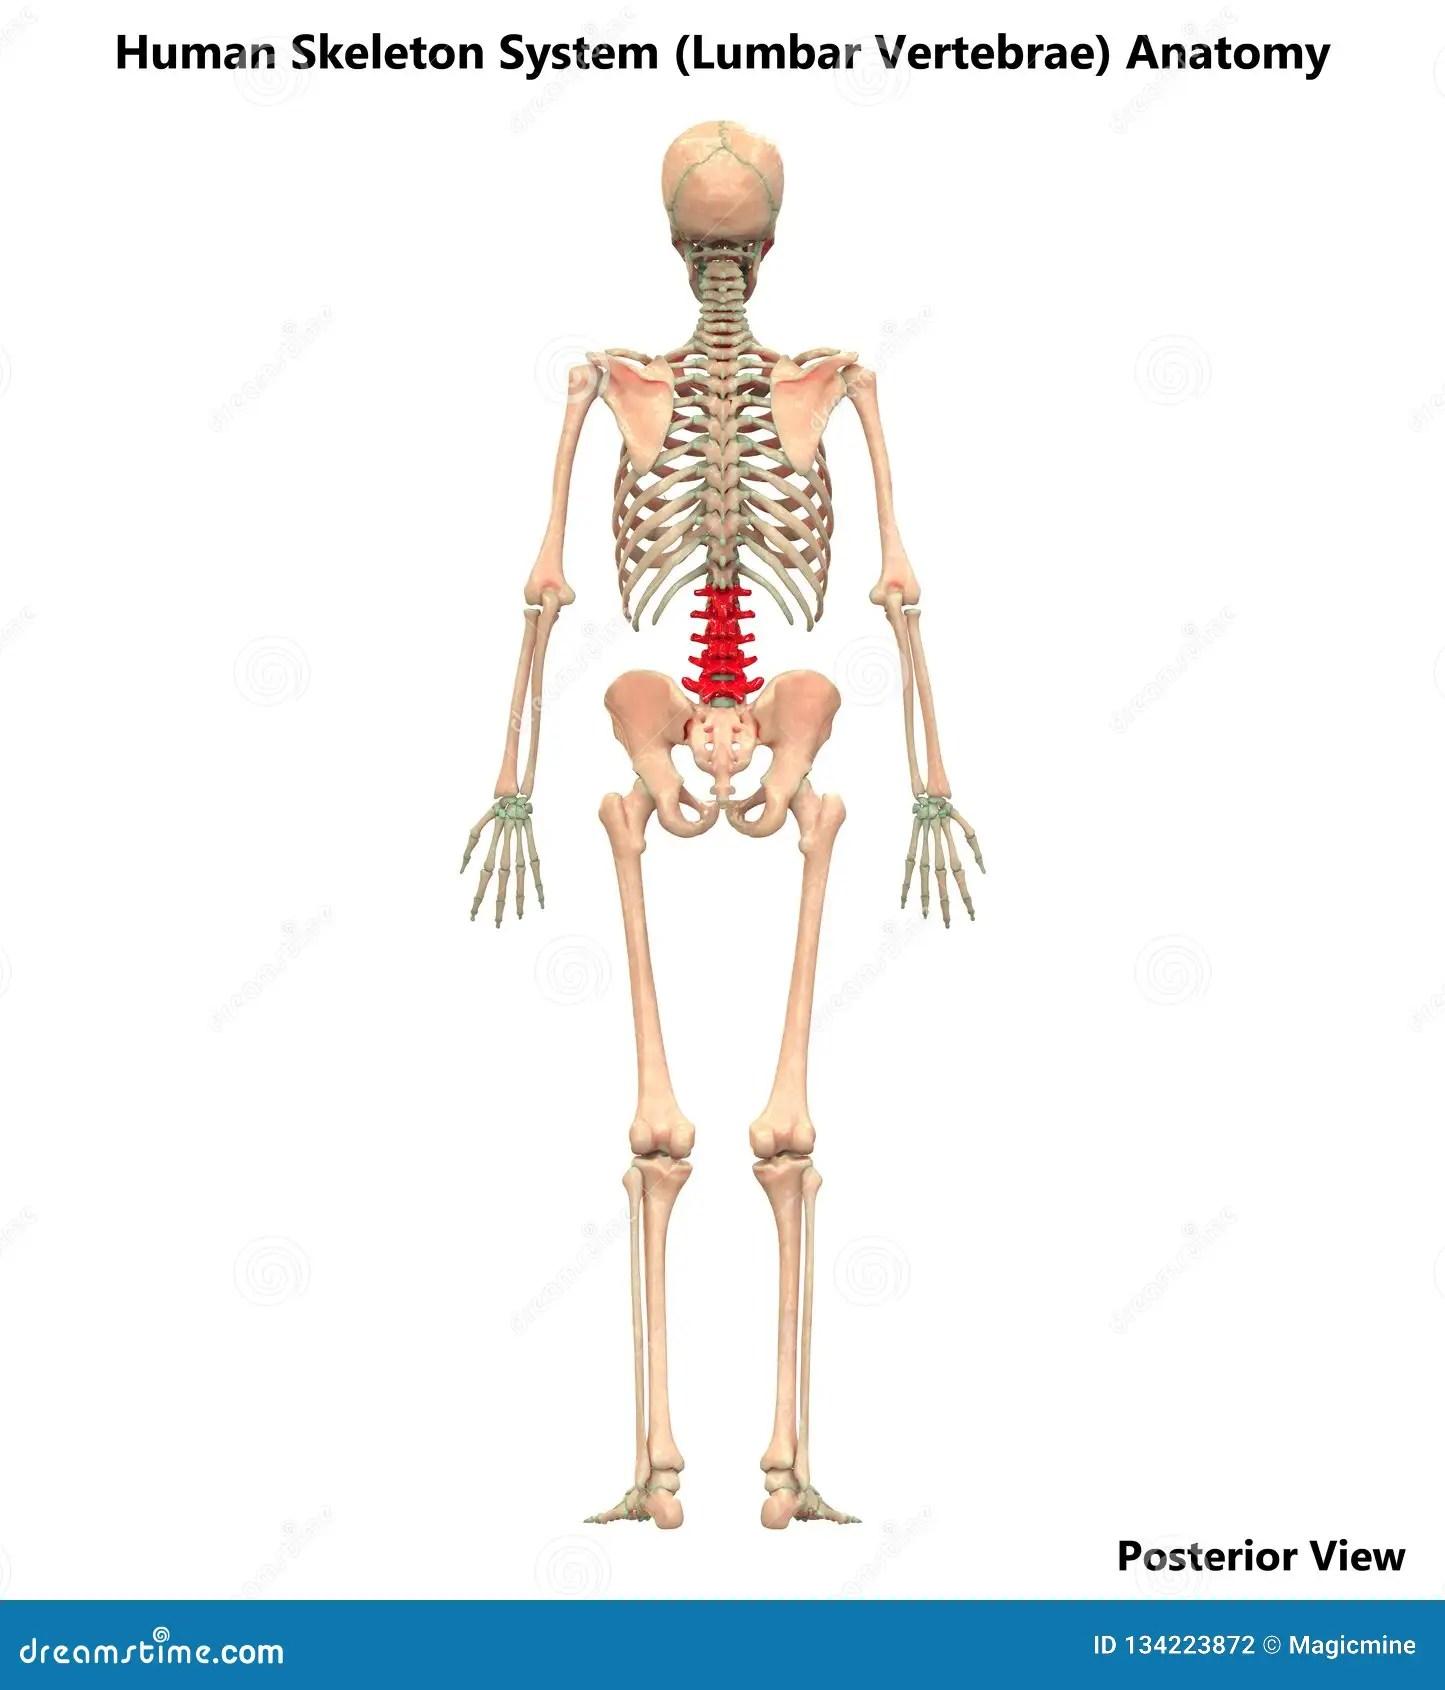 Human Skeleton System Vertebral Column Lumbar Vertebrae